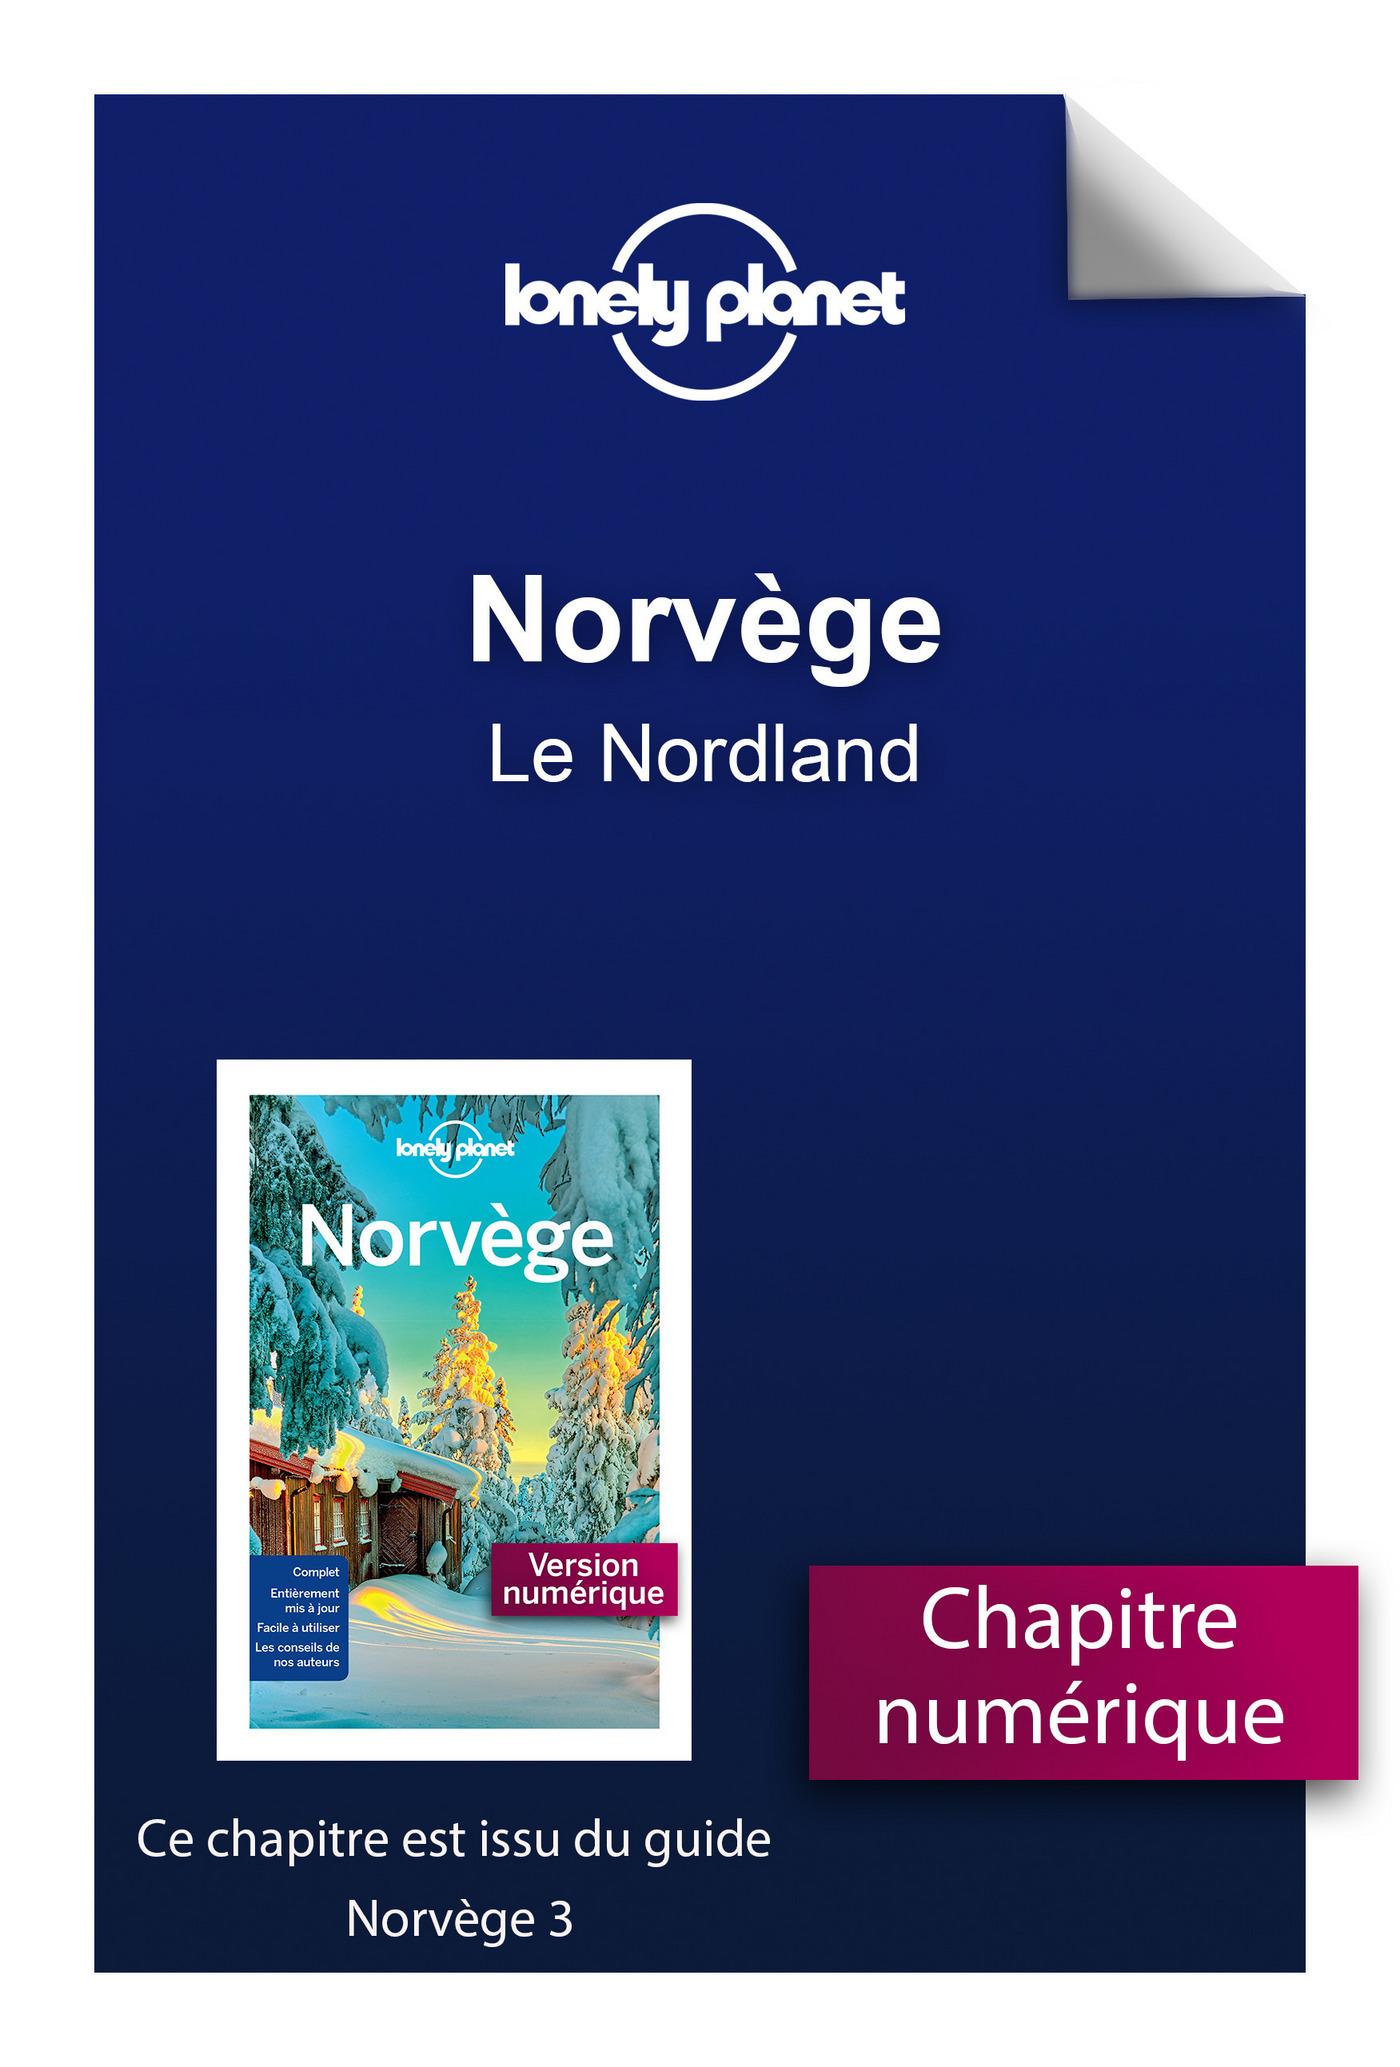 Norvège 3 - Le Nordland